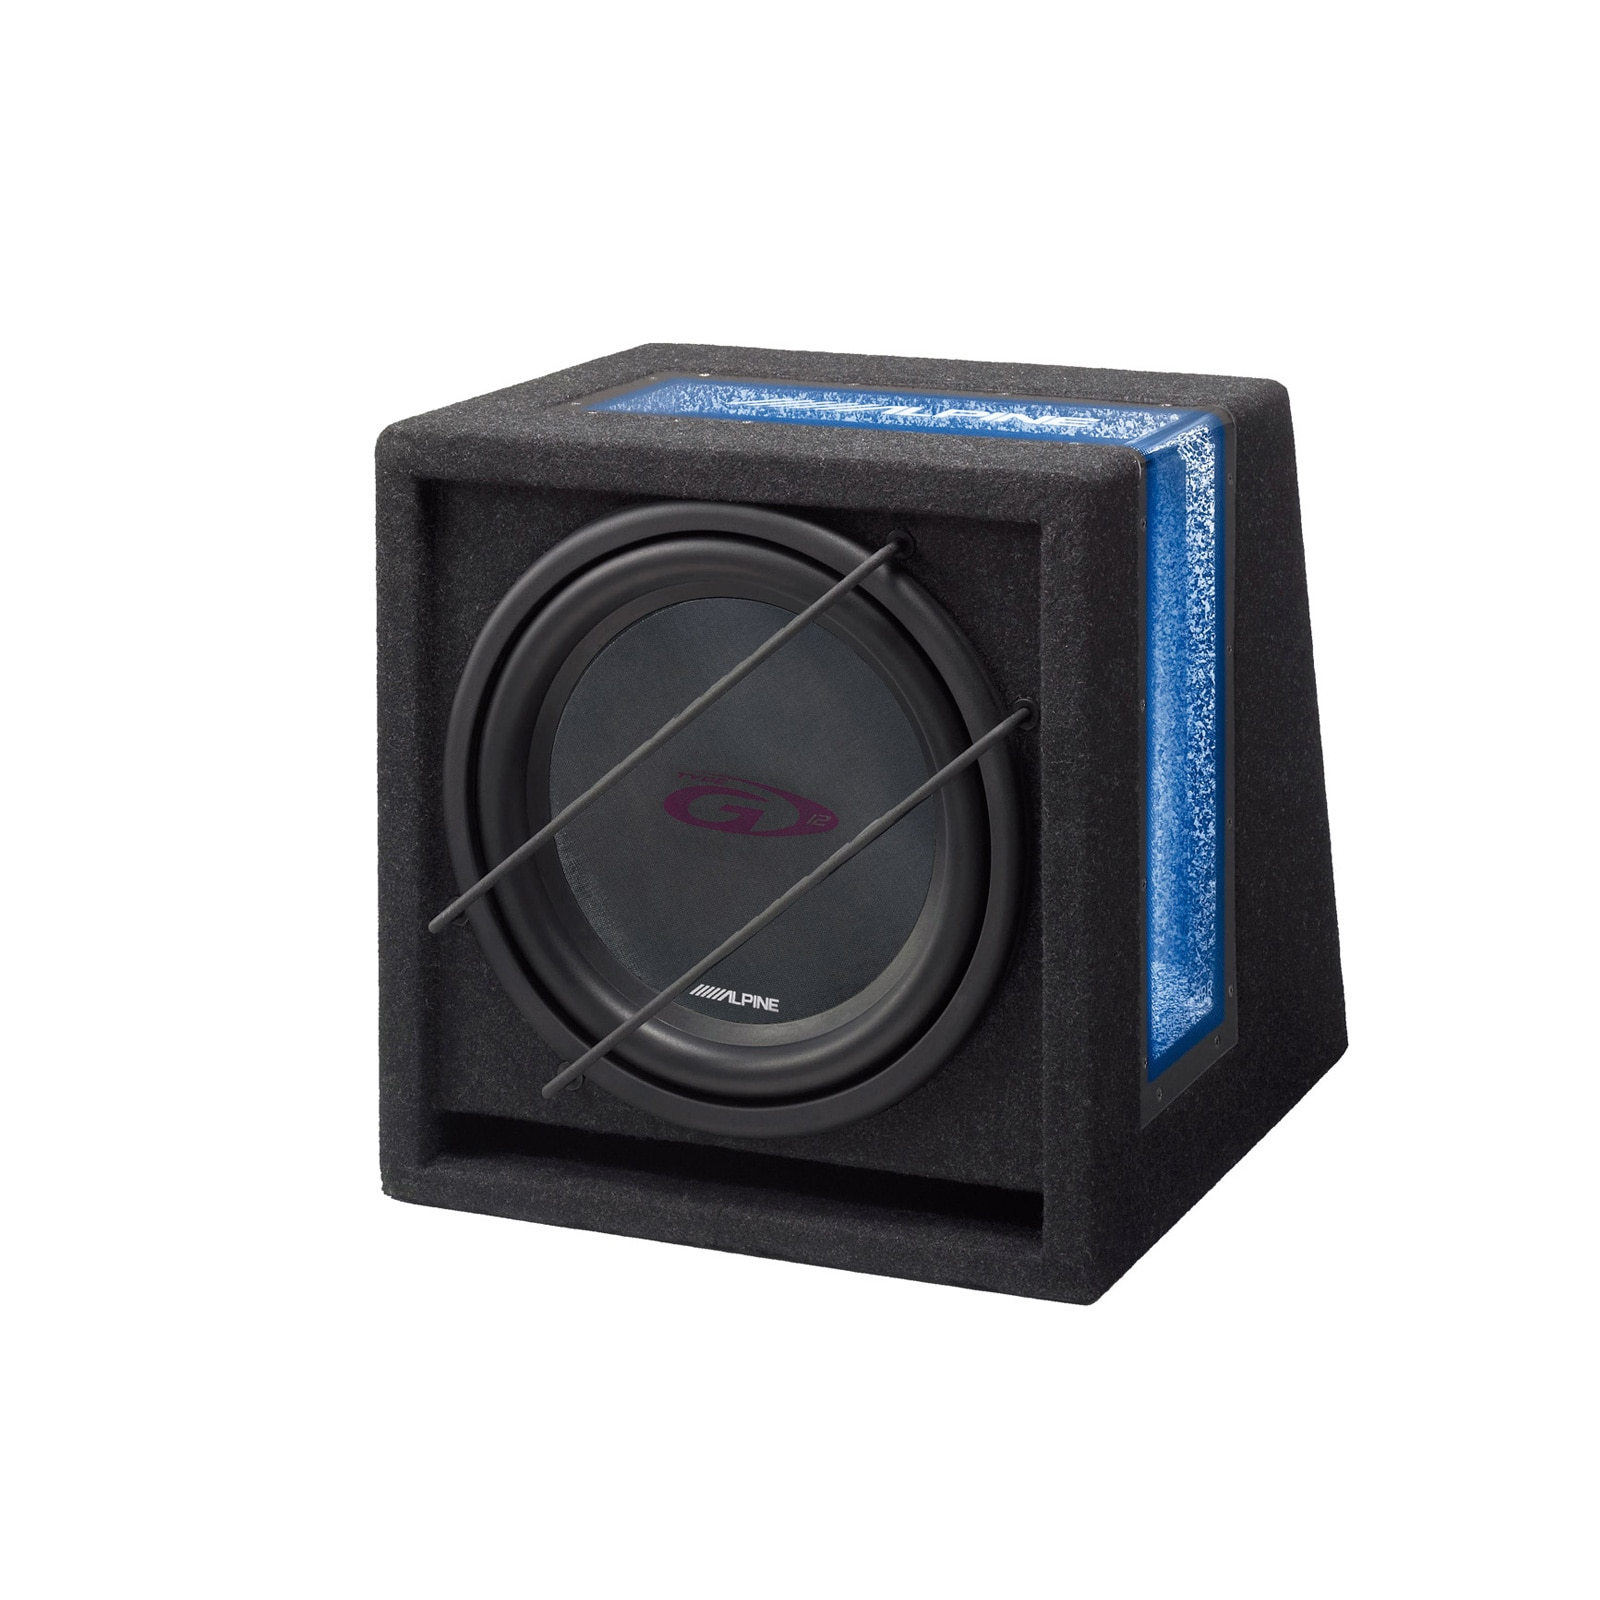 "Fotografie Subwoofer auto Alpine Bass Reflex, SBG-1224Br, 12"" (30 cm), 800W, 250 RMS, fereastra Acrylic cu iluminare albastra, 2 Ohmi"